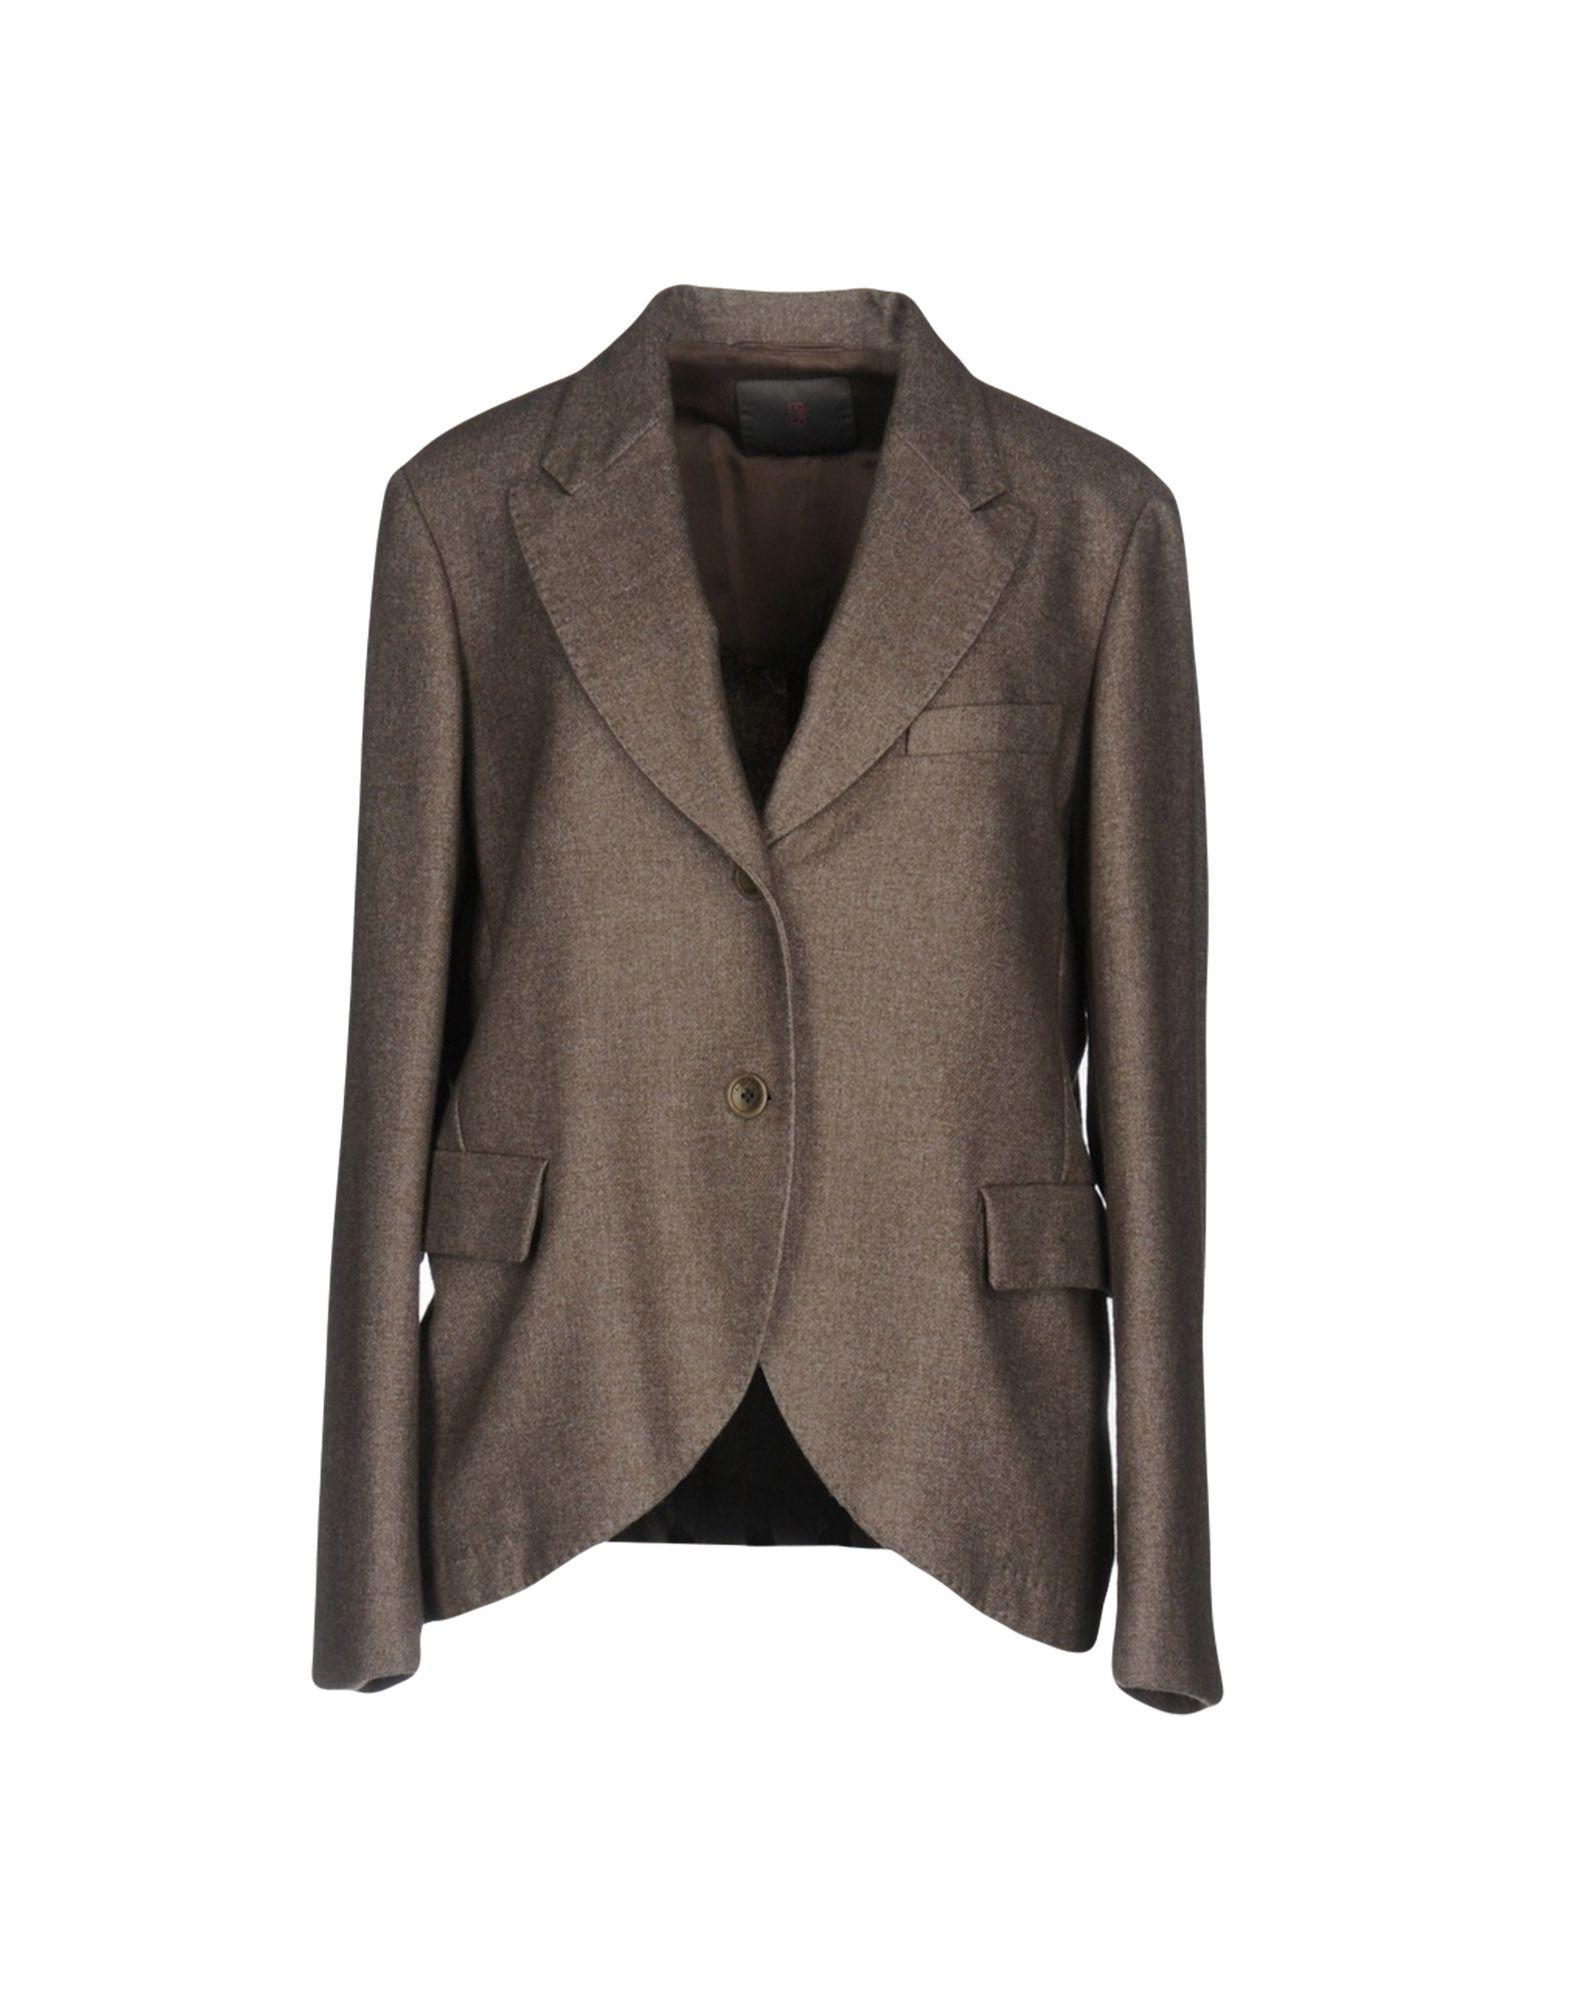 19.70 NINETEEN SEVENTY Damen Jackett Farbe Khaki Größe 7 jetztbilligerkaufen